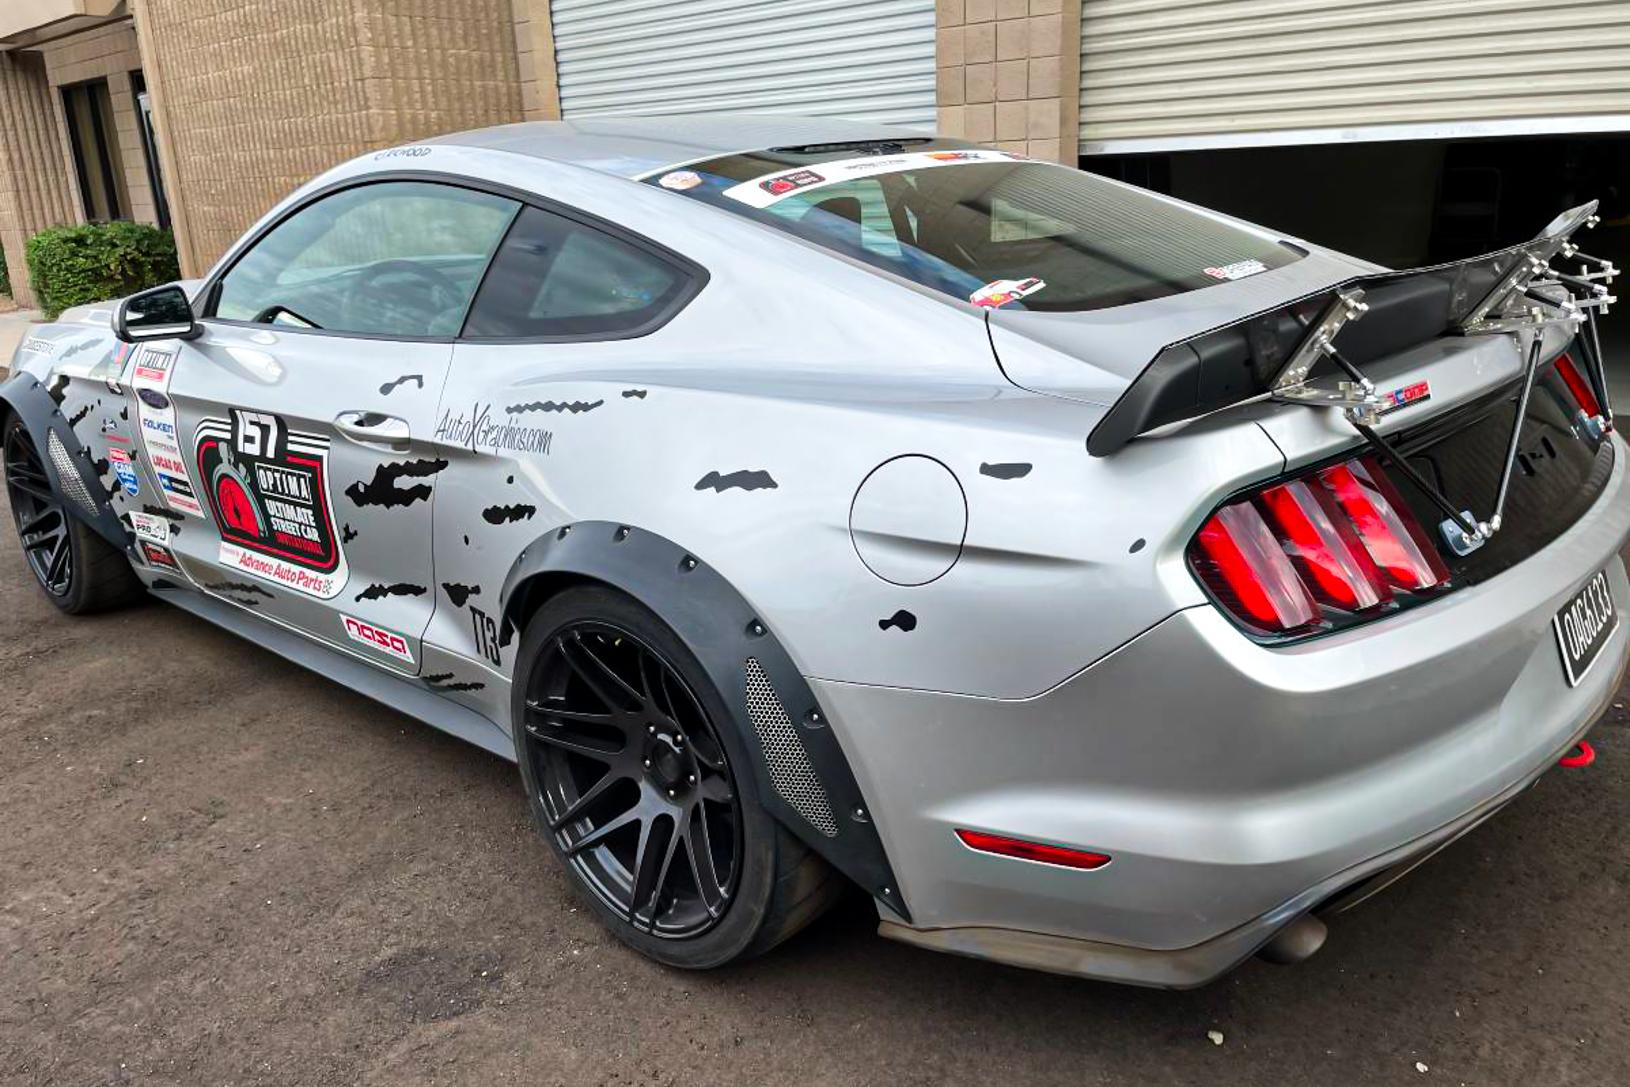 2016 Mustang GT 'Track Car'